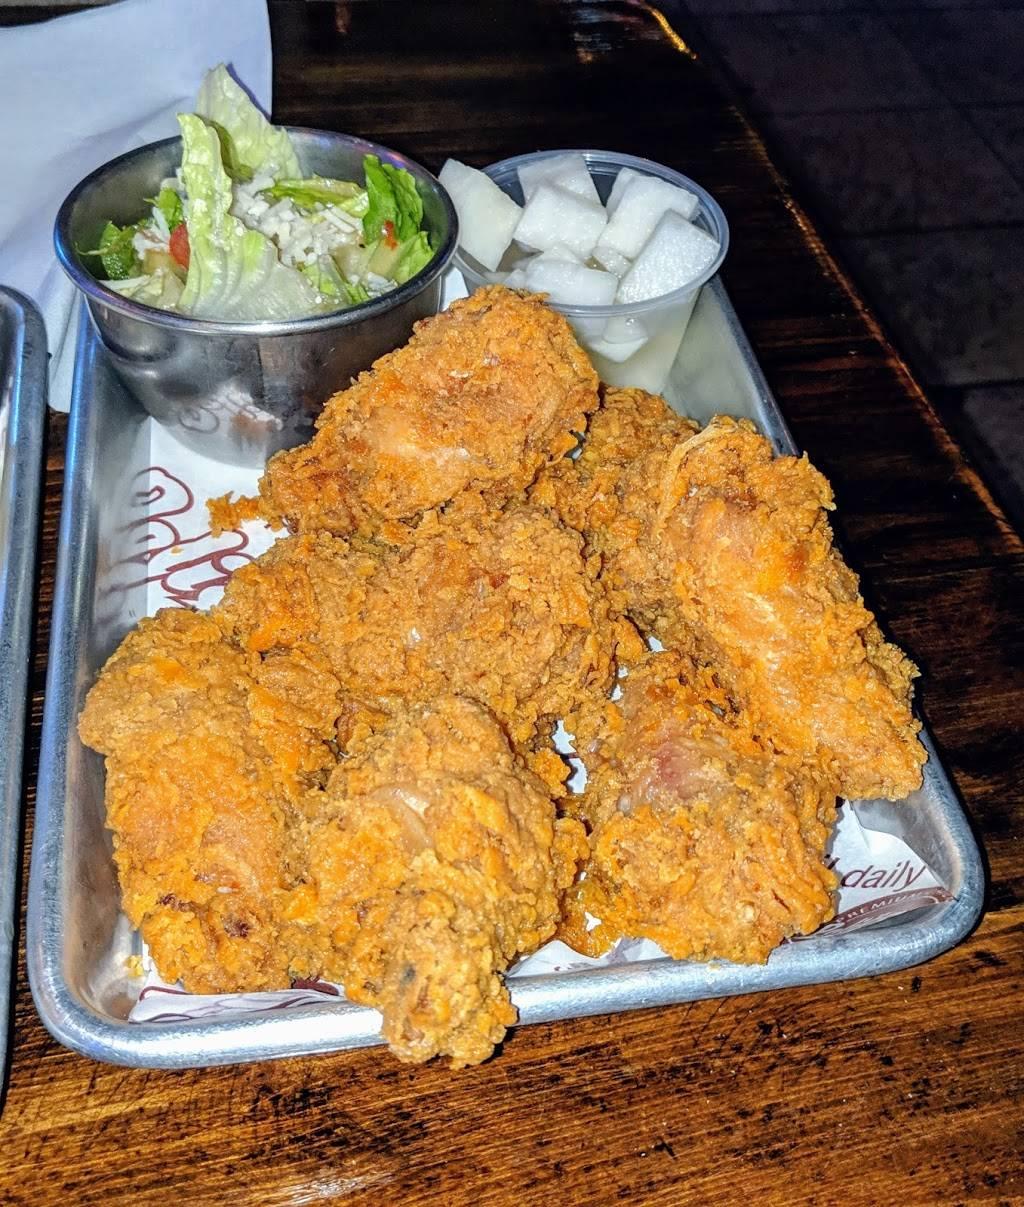 Pelicana Chicken   meal takeaway   417 E Brinkerhoff Ave, Palisades Park, NJ 07650, USA   2014820642 OR +1 201-482-0642